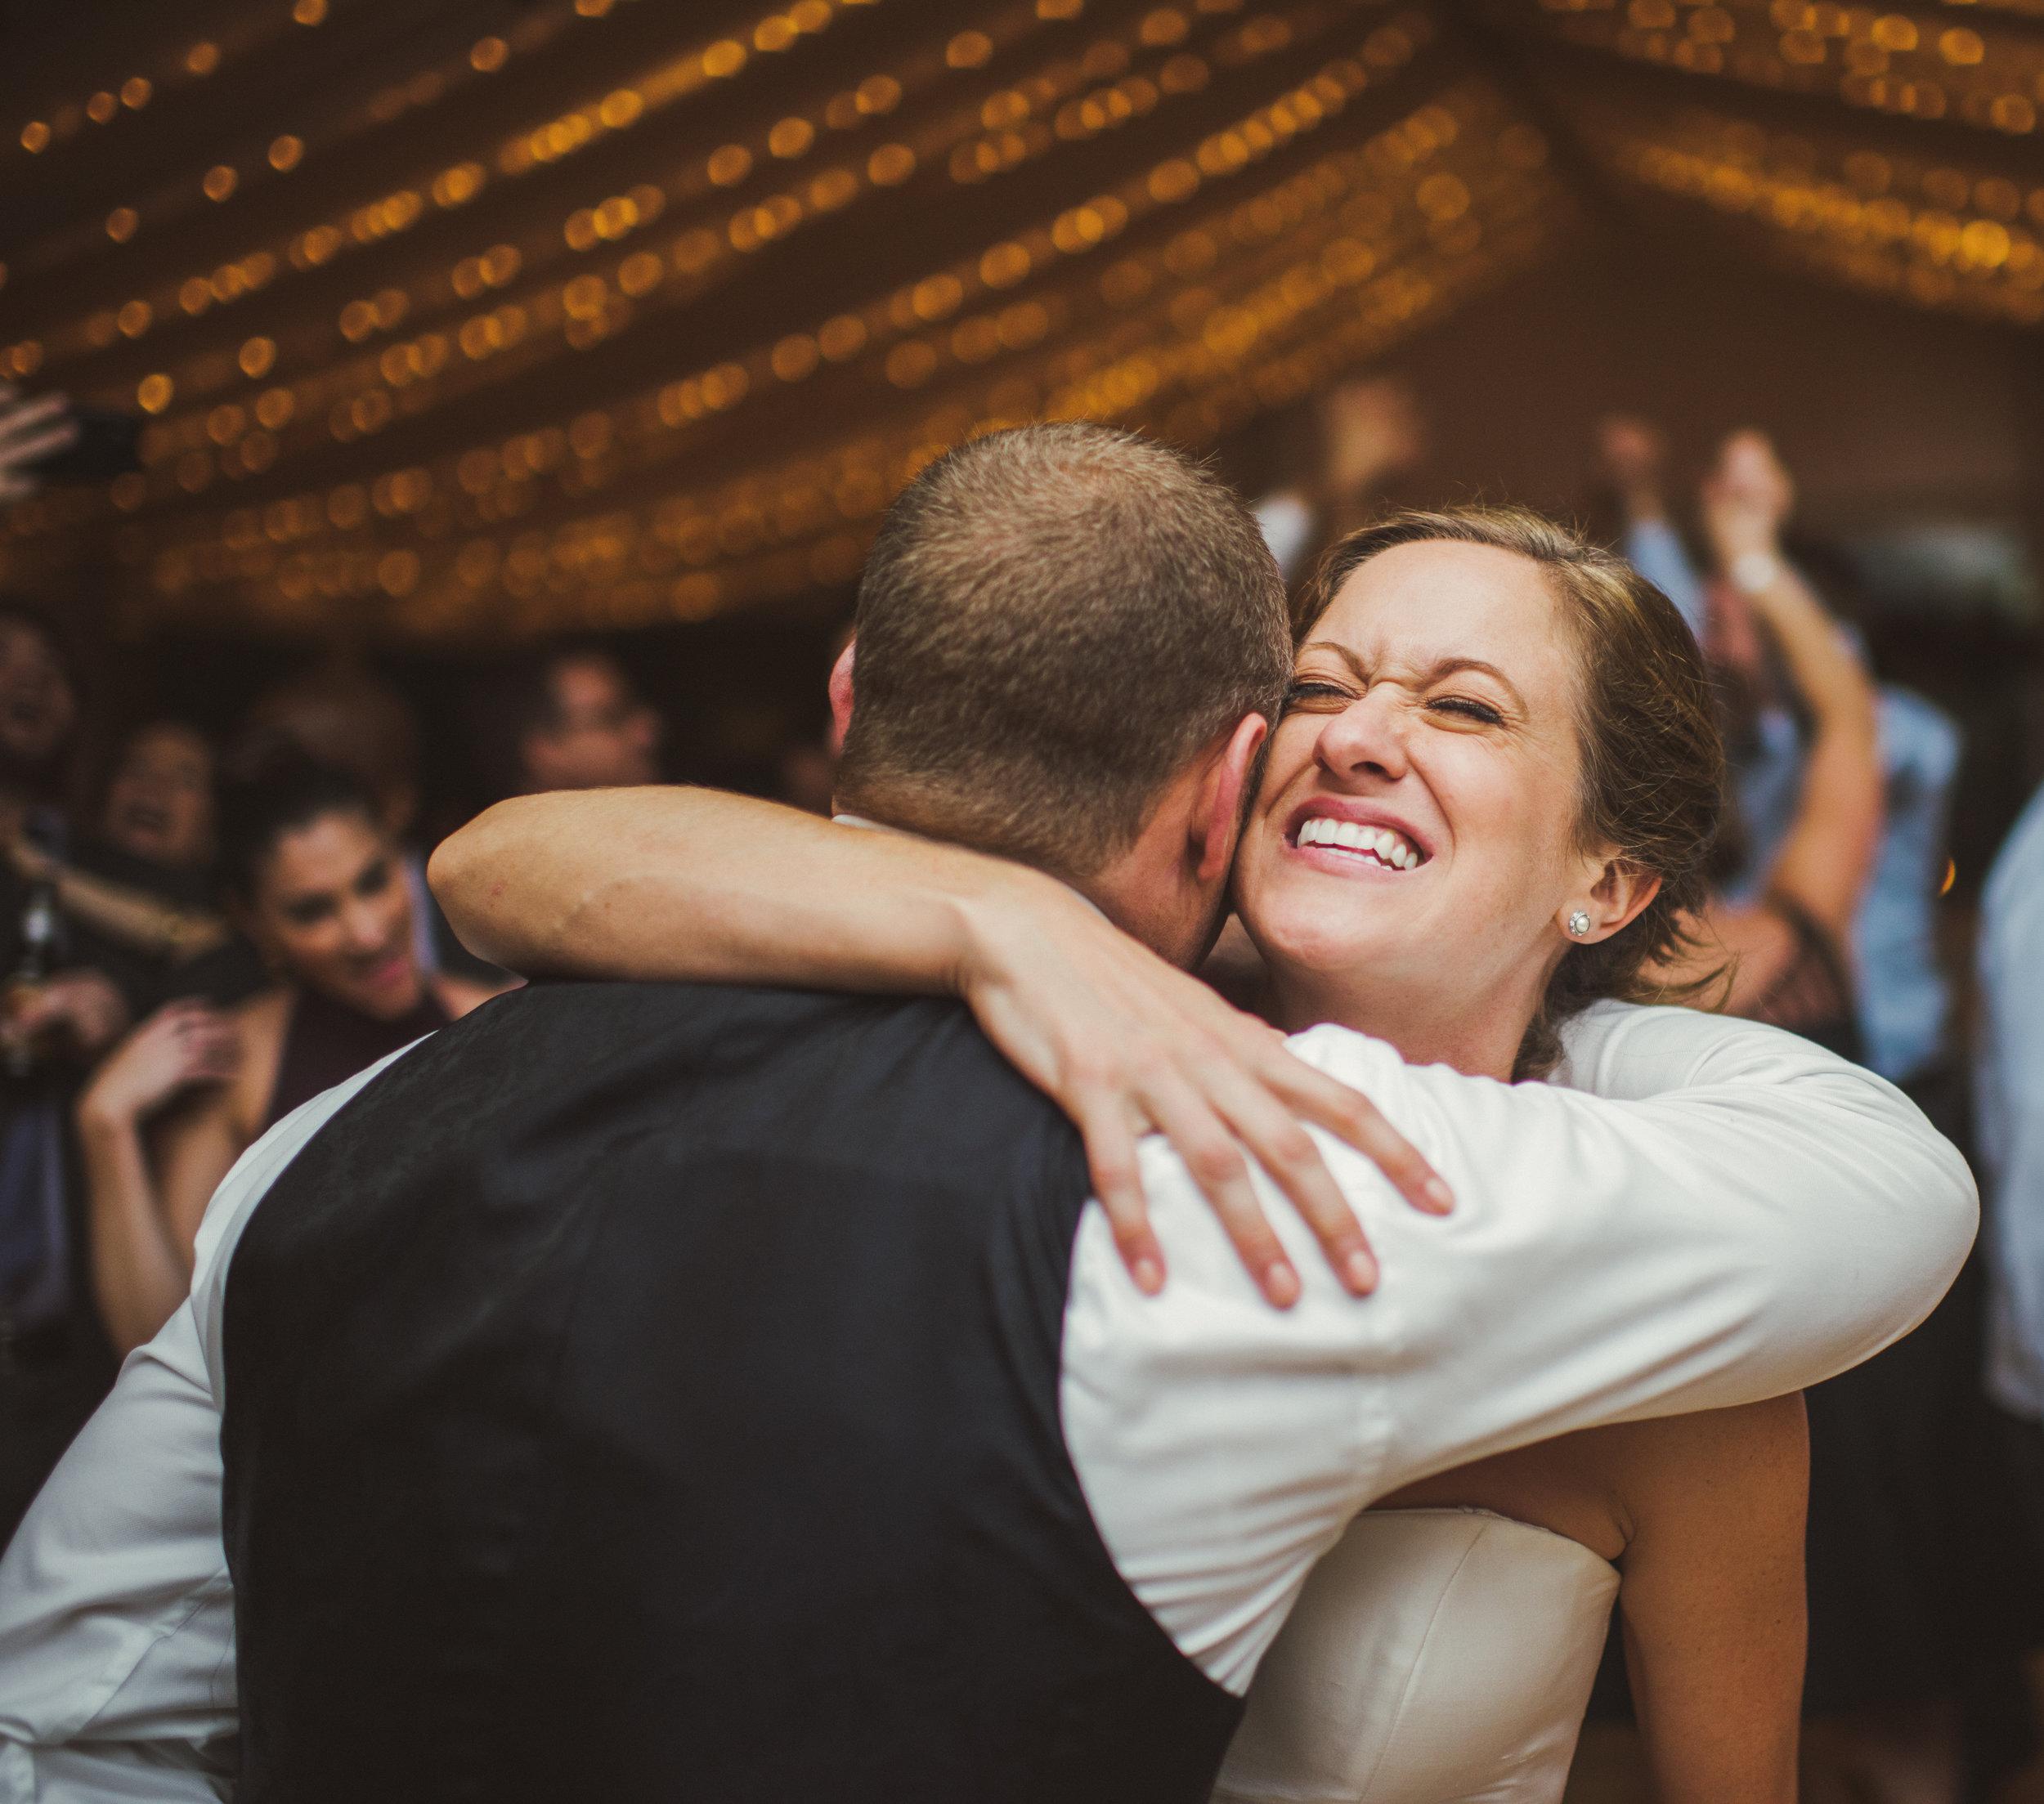 JACQUELINE & ANDREW WARSHAWER -BROOKMILL FARM FALL WEDDING - INTIMATE WEDDING PHOTOGRAPHER - TWOTWENTY by CHI-CHI AGBIM-815.jpg